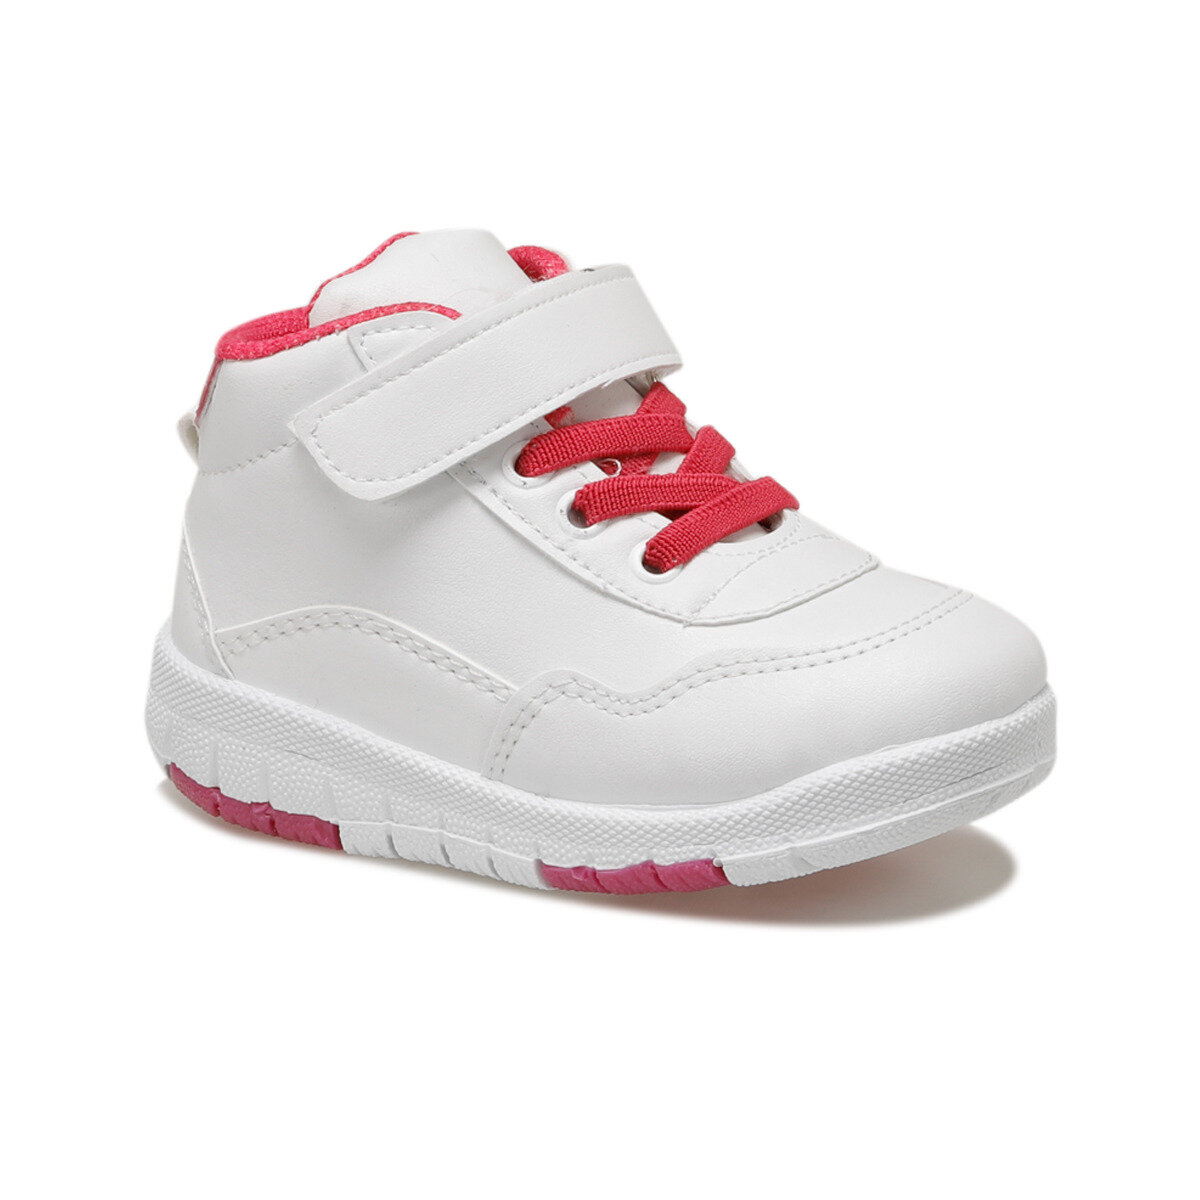 FLO LARIS White Female Child Boots I-Cool